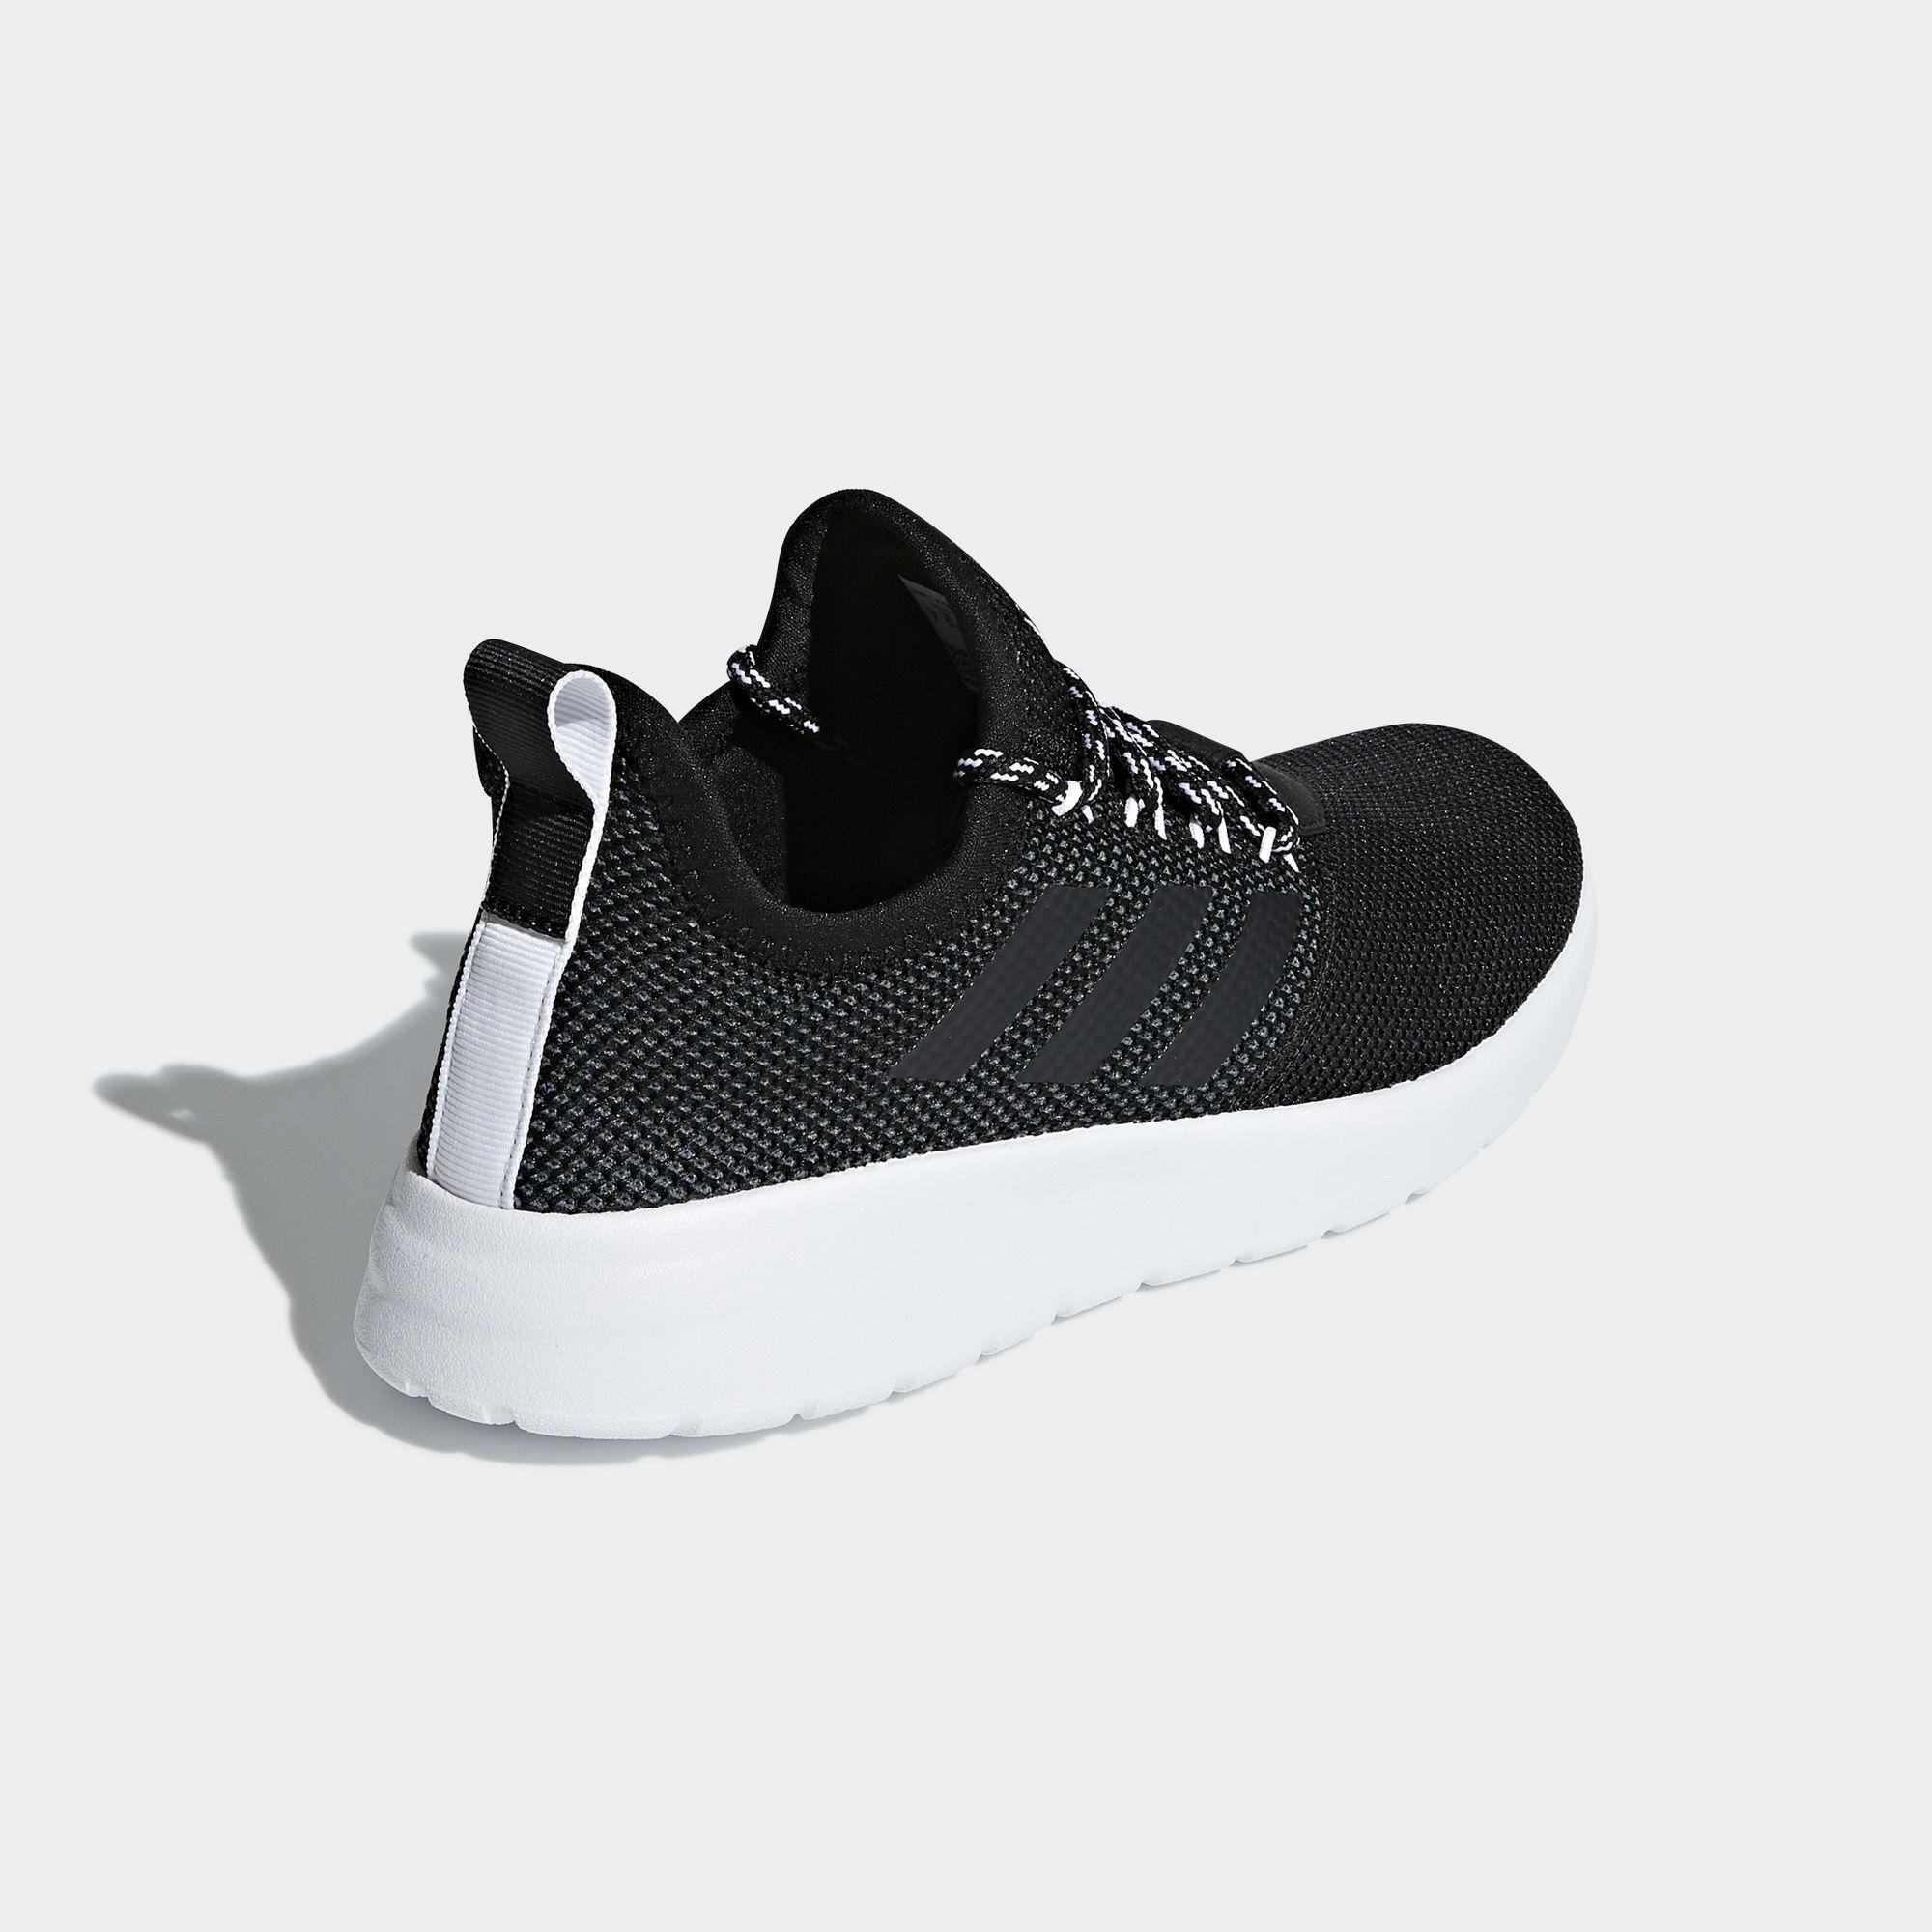 3bcc14e0885 Adidas - Black Lite Racer Reborn Shoes - Lyst. View fullscreen